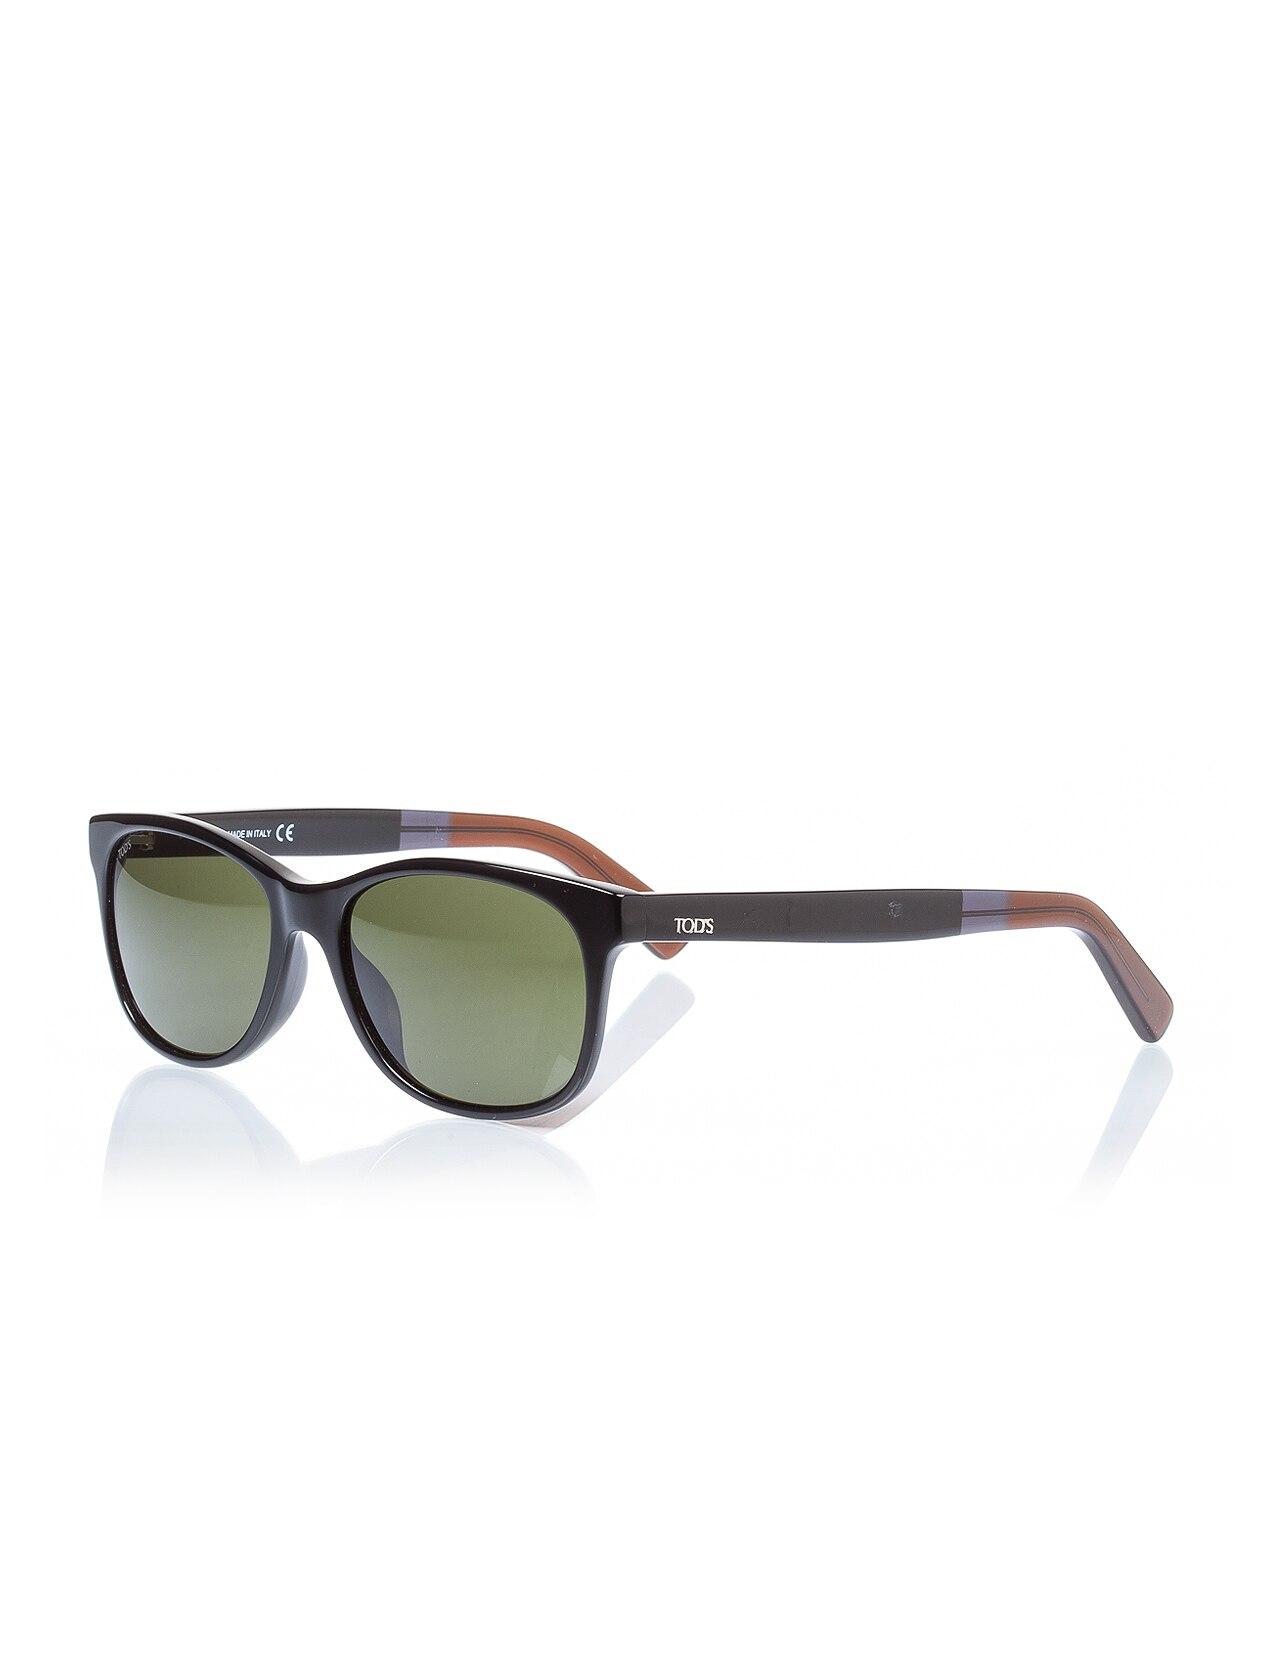 Men's Sunglasses To 0190 01n Bone Black Organic Rectangle Rectangular 55-17-145 Tods